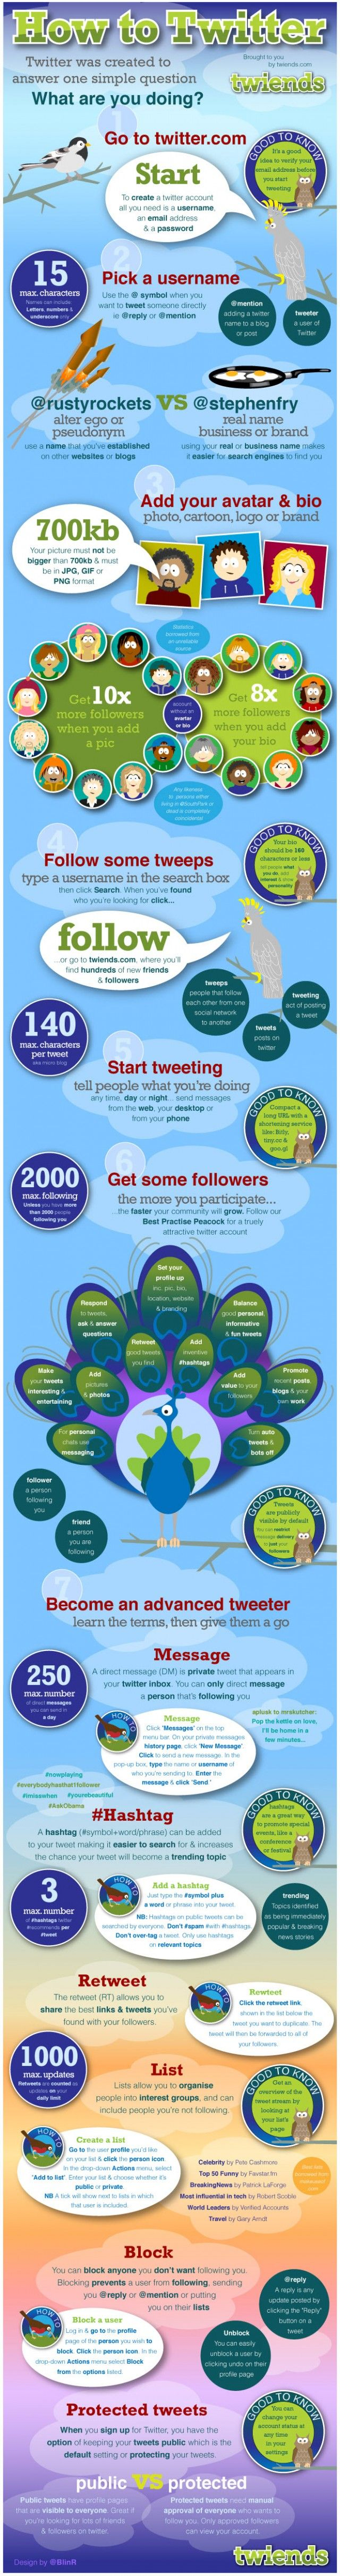 How to Twitter #infographic #socialmedia #marketing